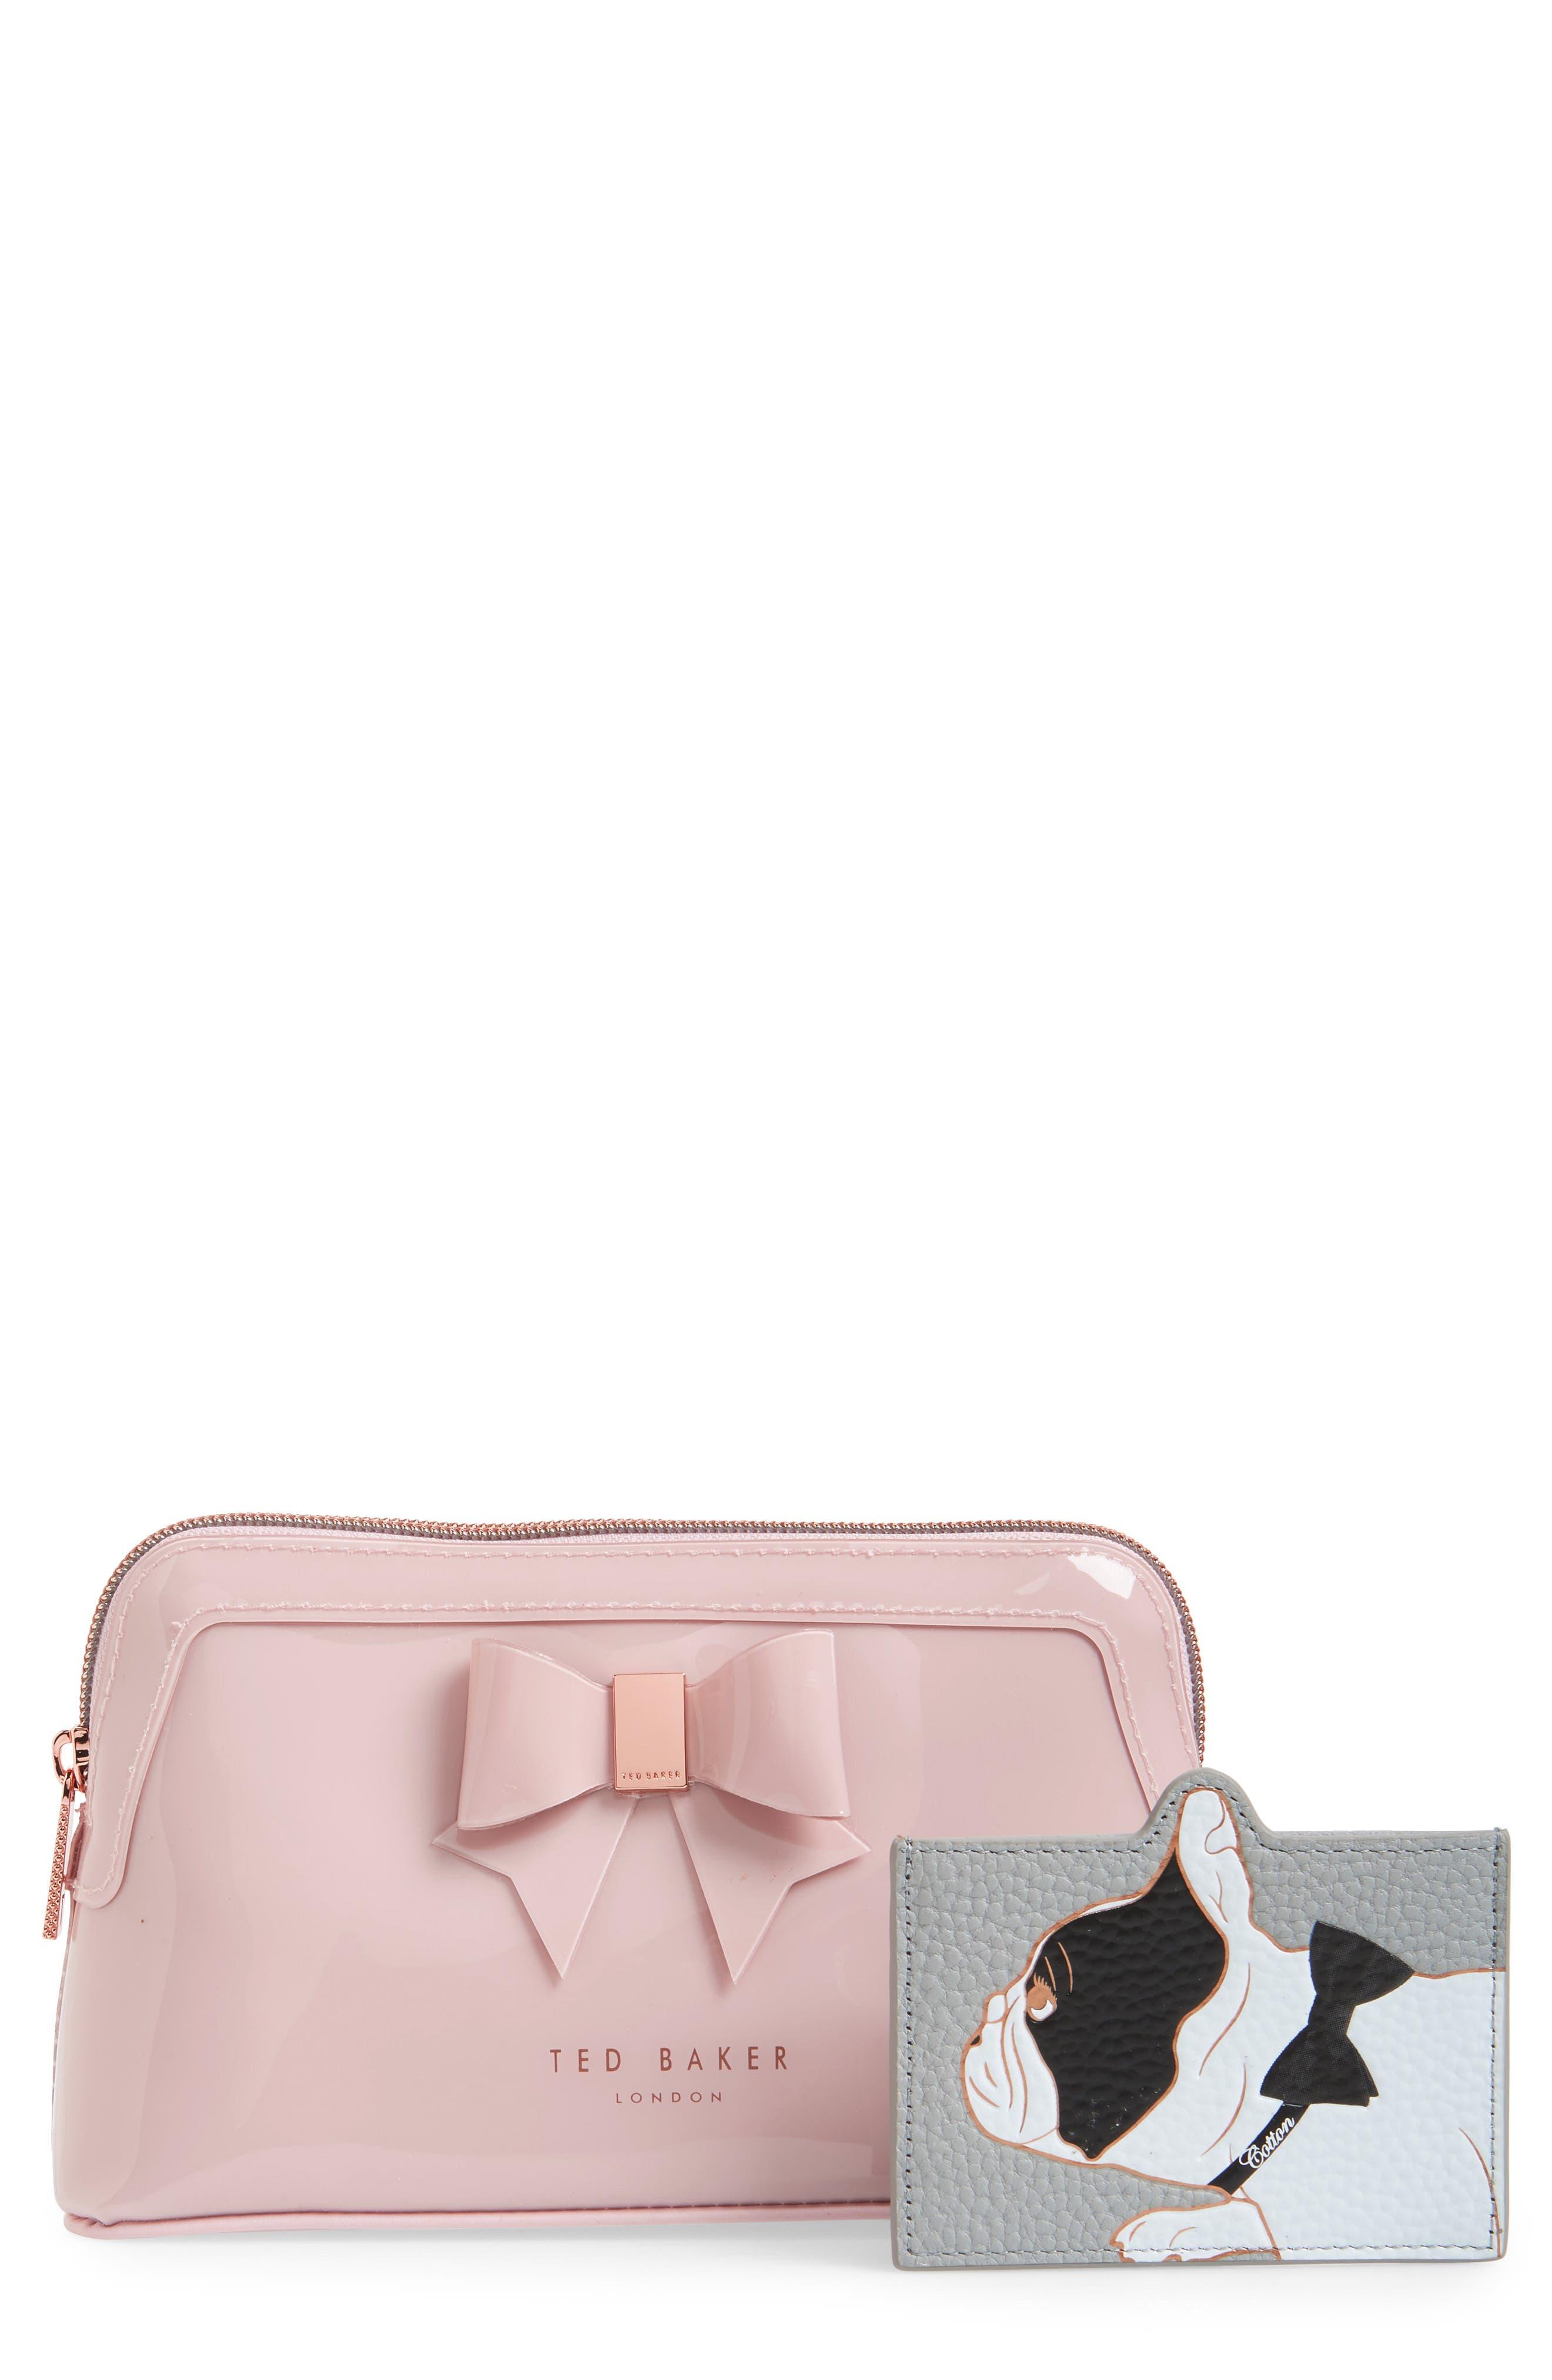 Celest Cosmetics Case & Cardholder Set,                             Main thumbnail 1, color,                             GREY